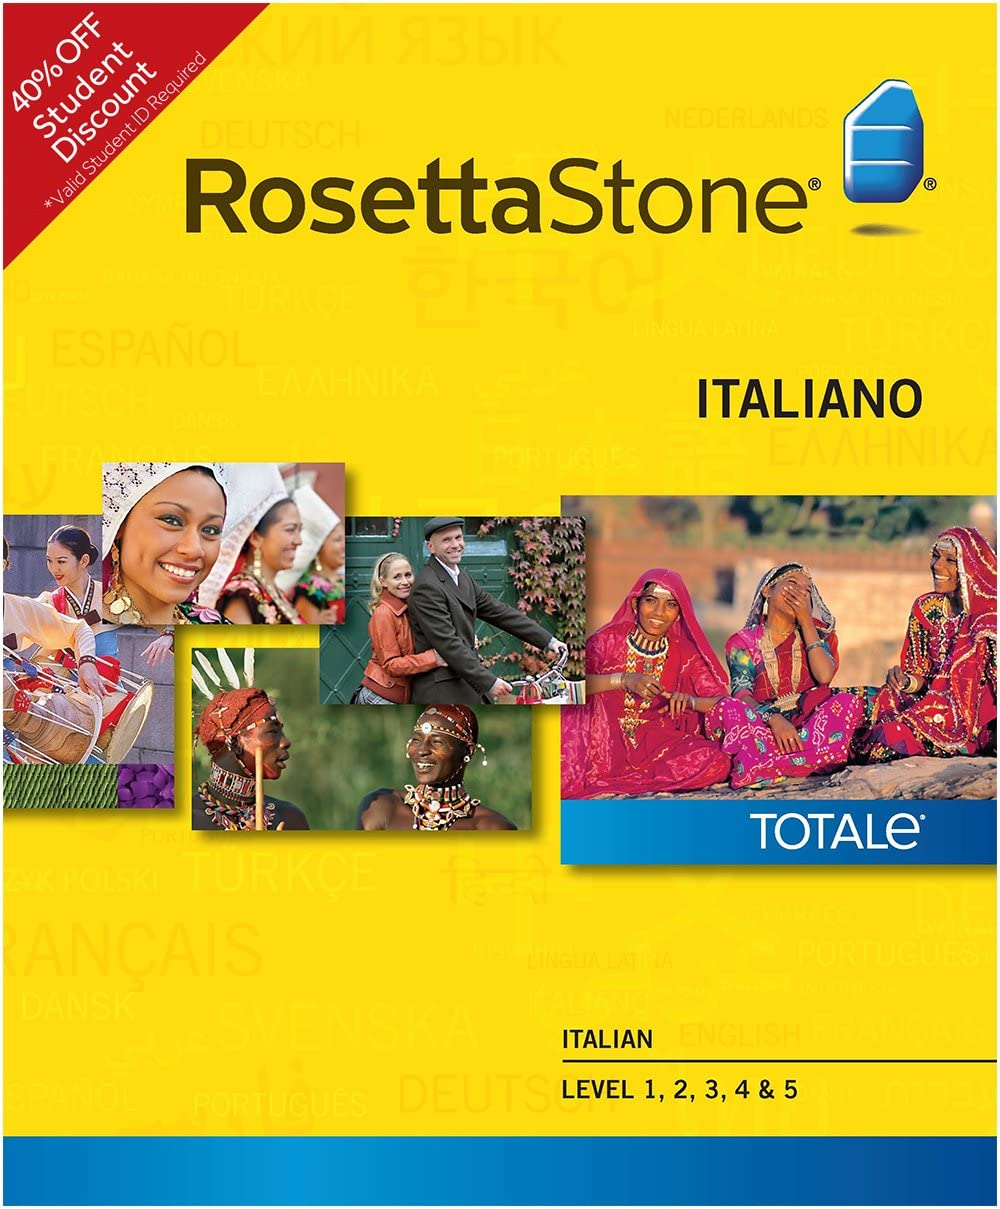 Rosetta Stone Italian Level 1-5